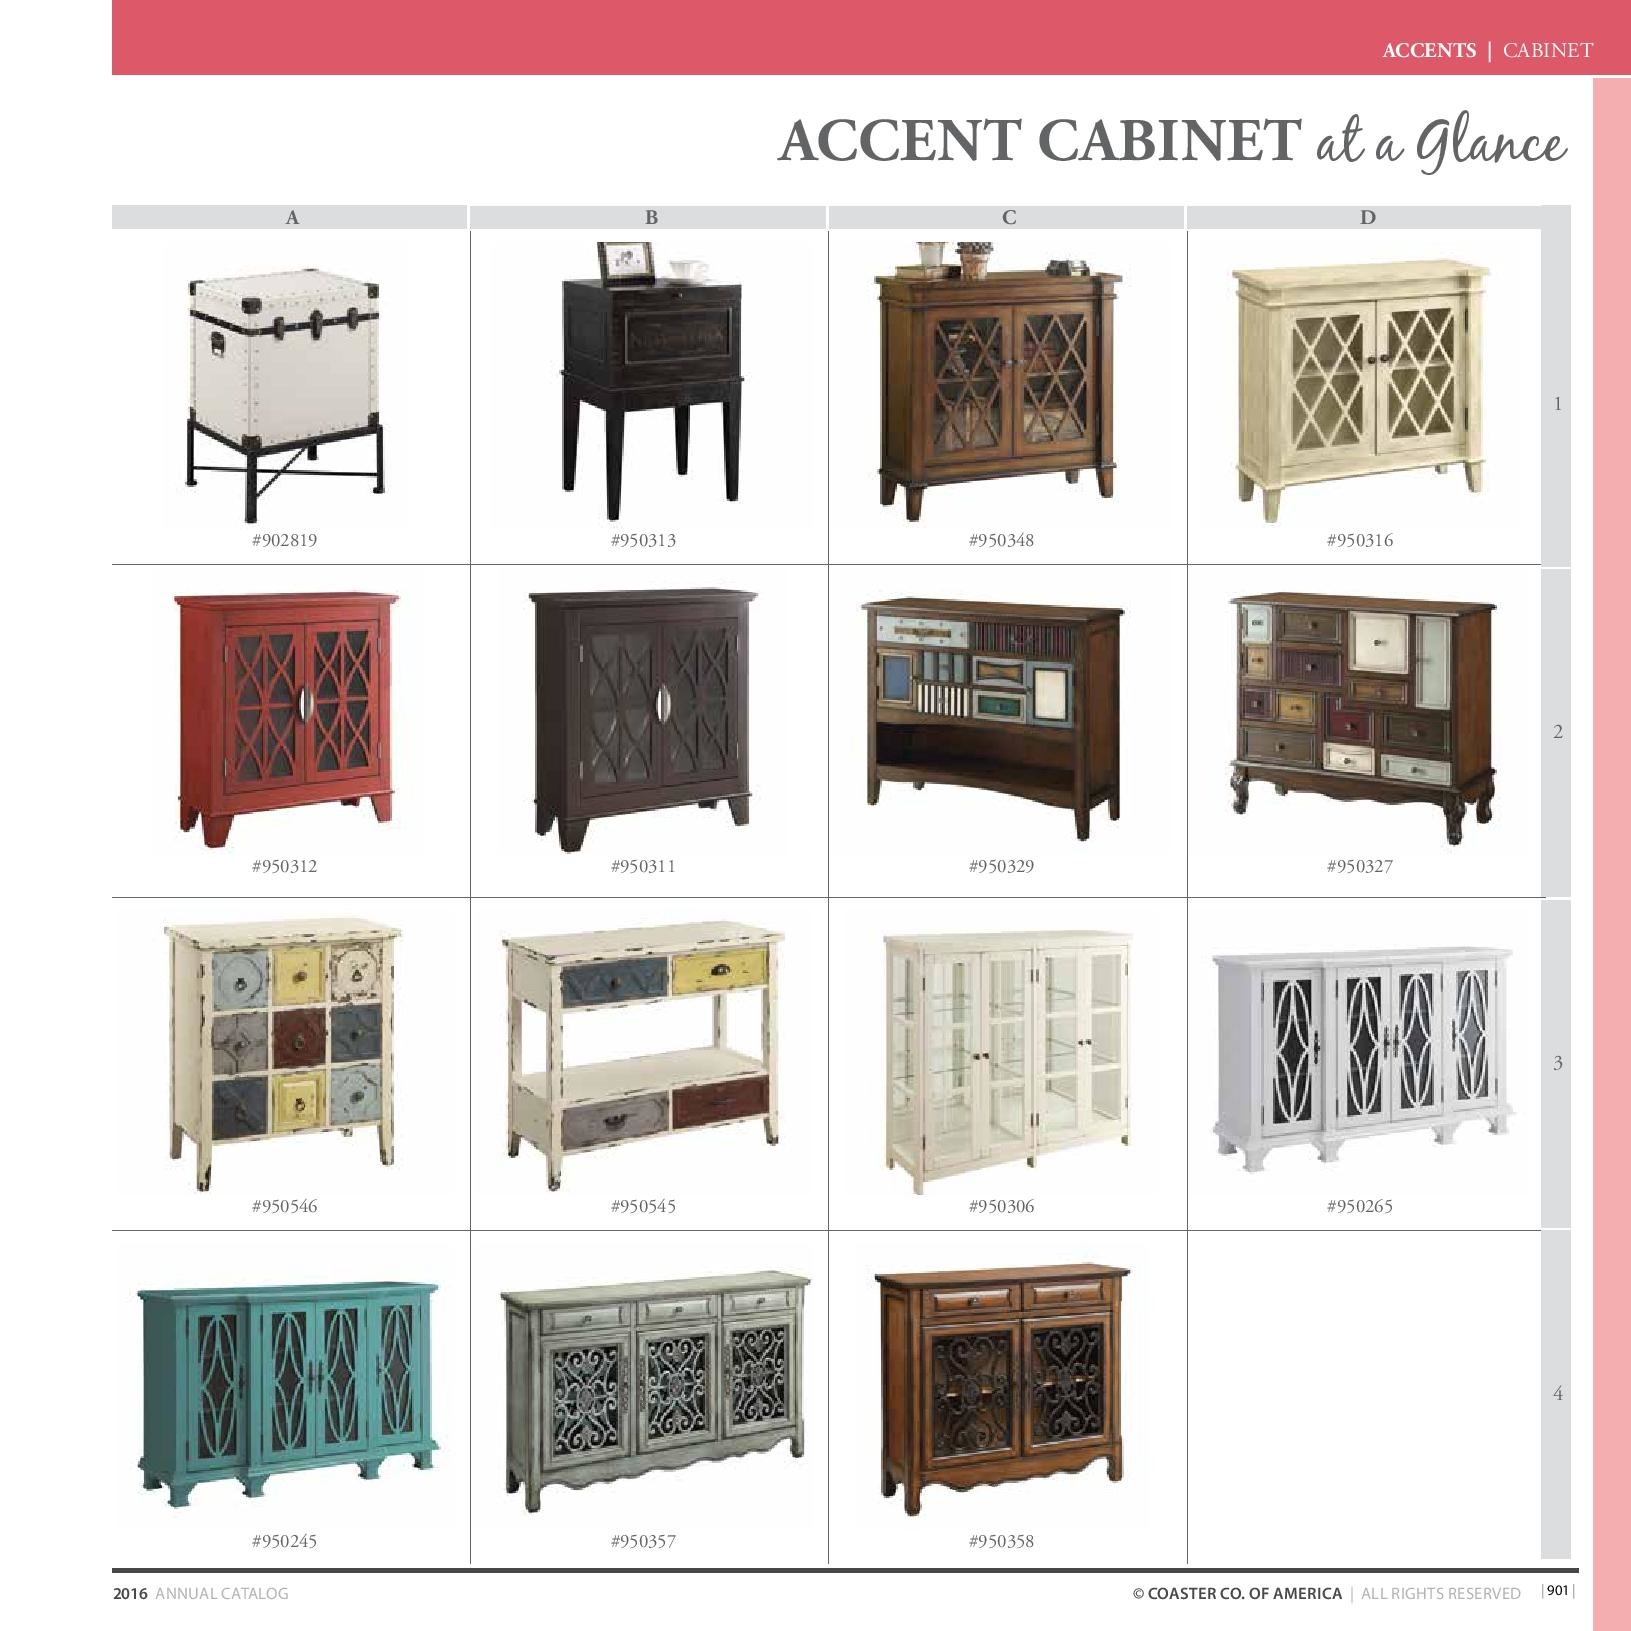 American comfort furniture mattress discount chicago for Cheap local furniture